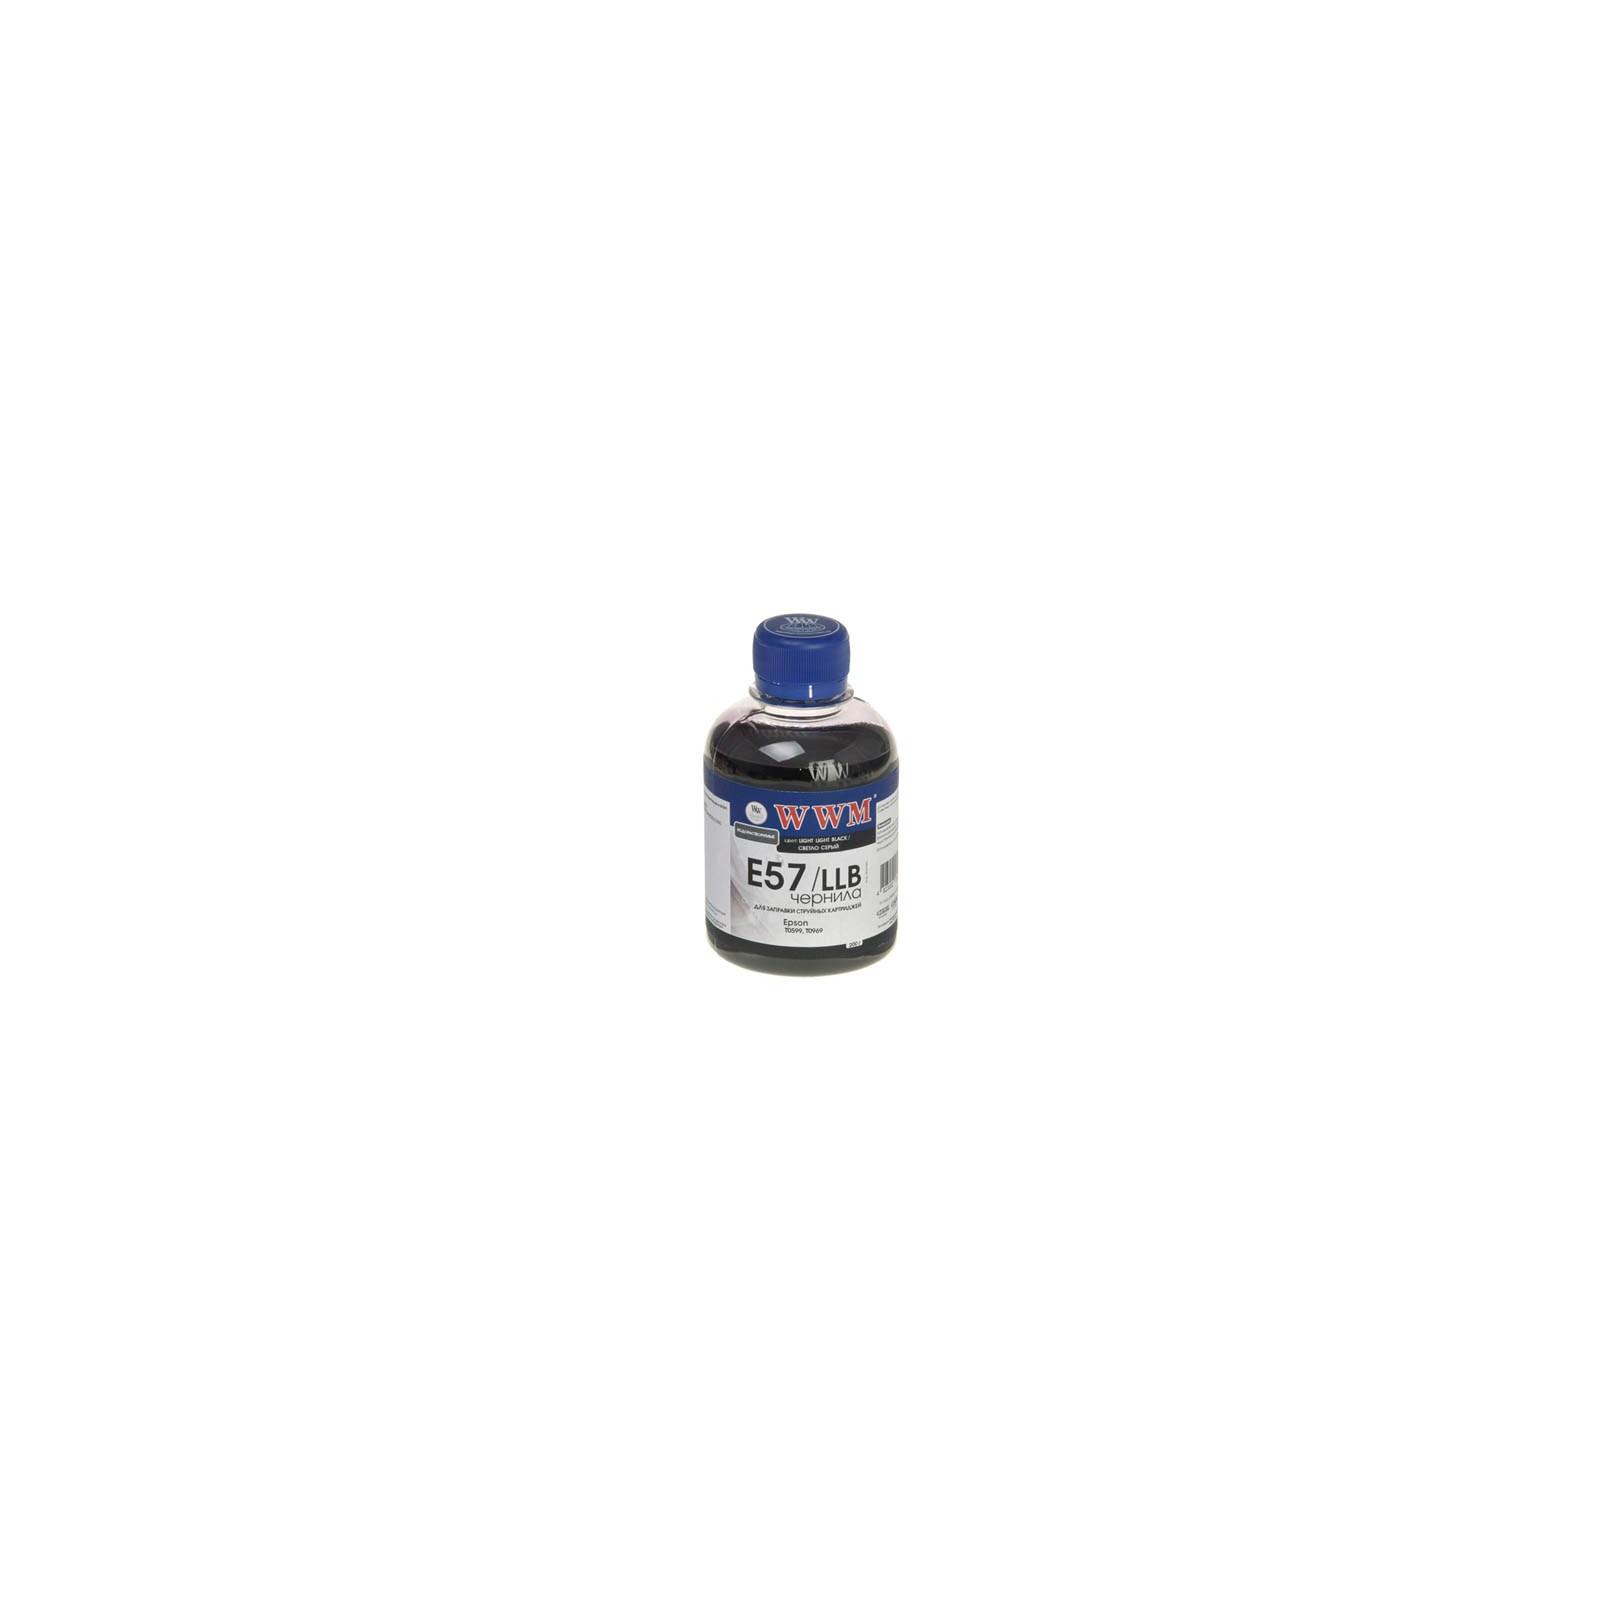 Чернила WWM EPSON R2400/2880Light Light Black (E57/LLB)